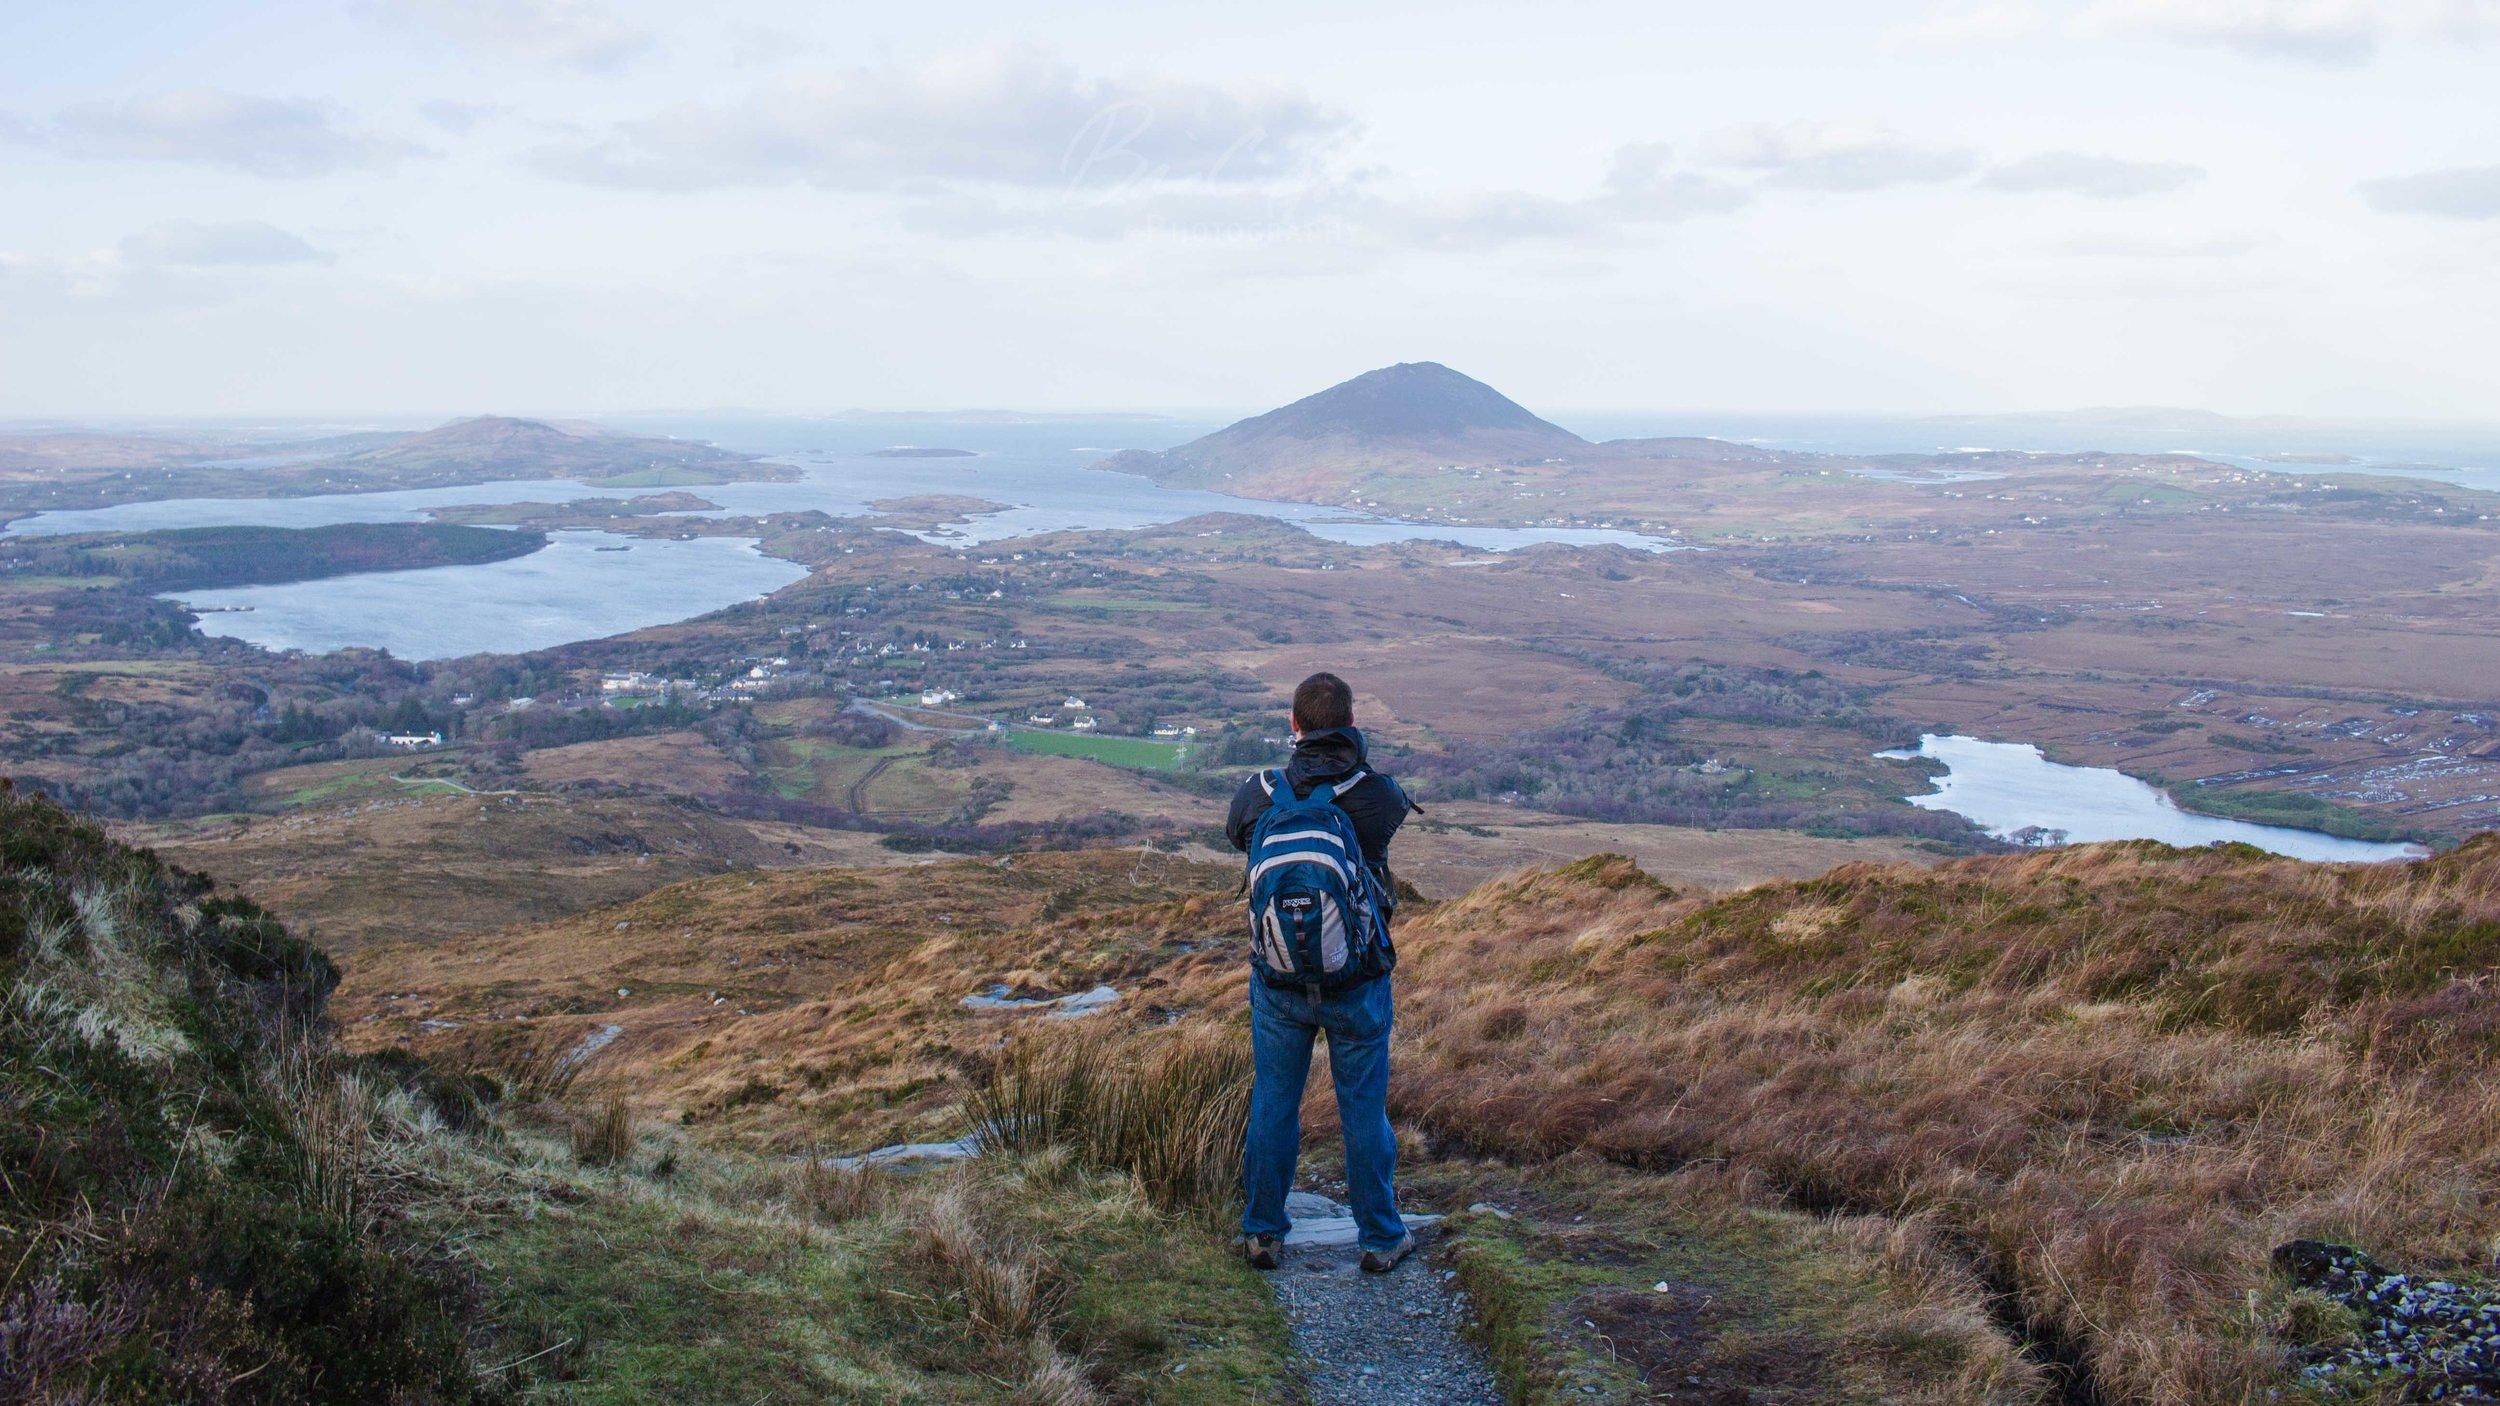 Wanderer. Connemara National Park, Ireland.